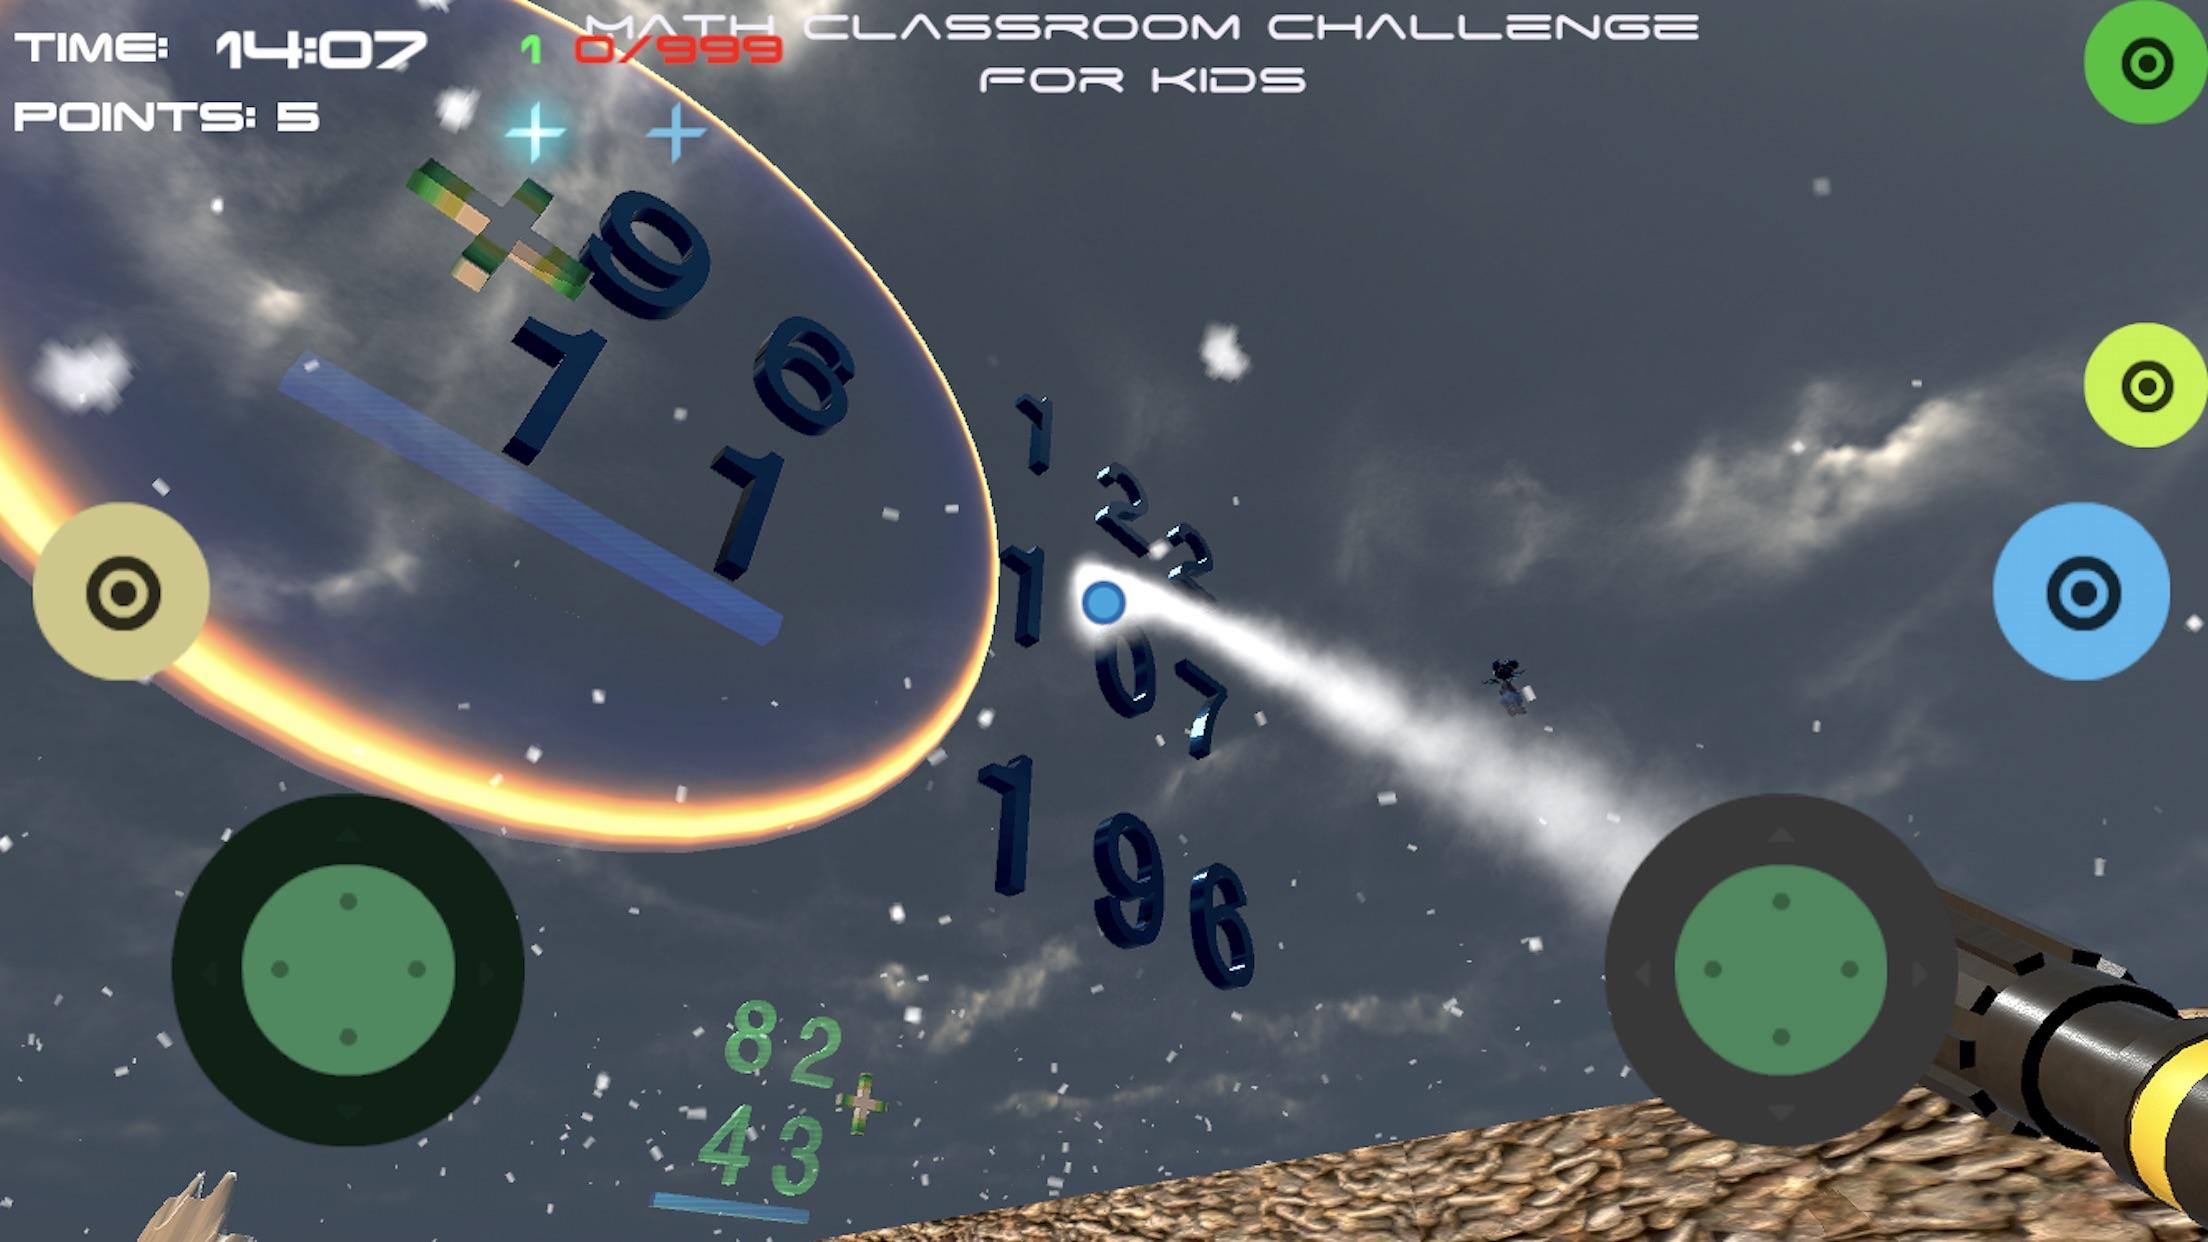 Math Classroom Challenge 1.25 - Winter Dragon Edition Image